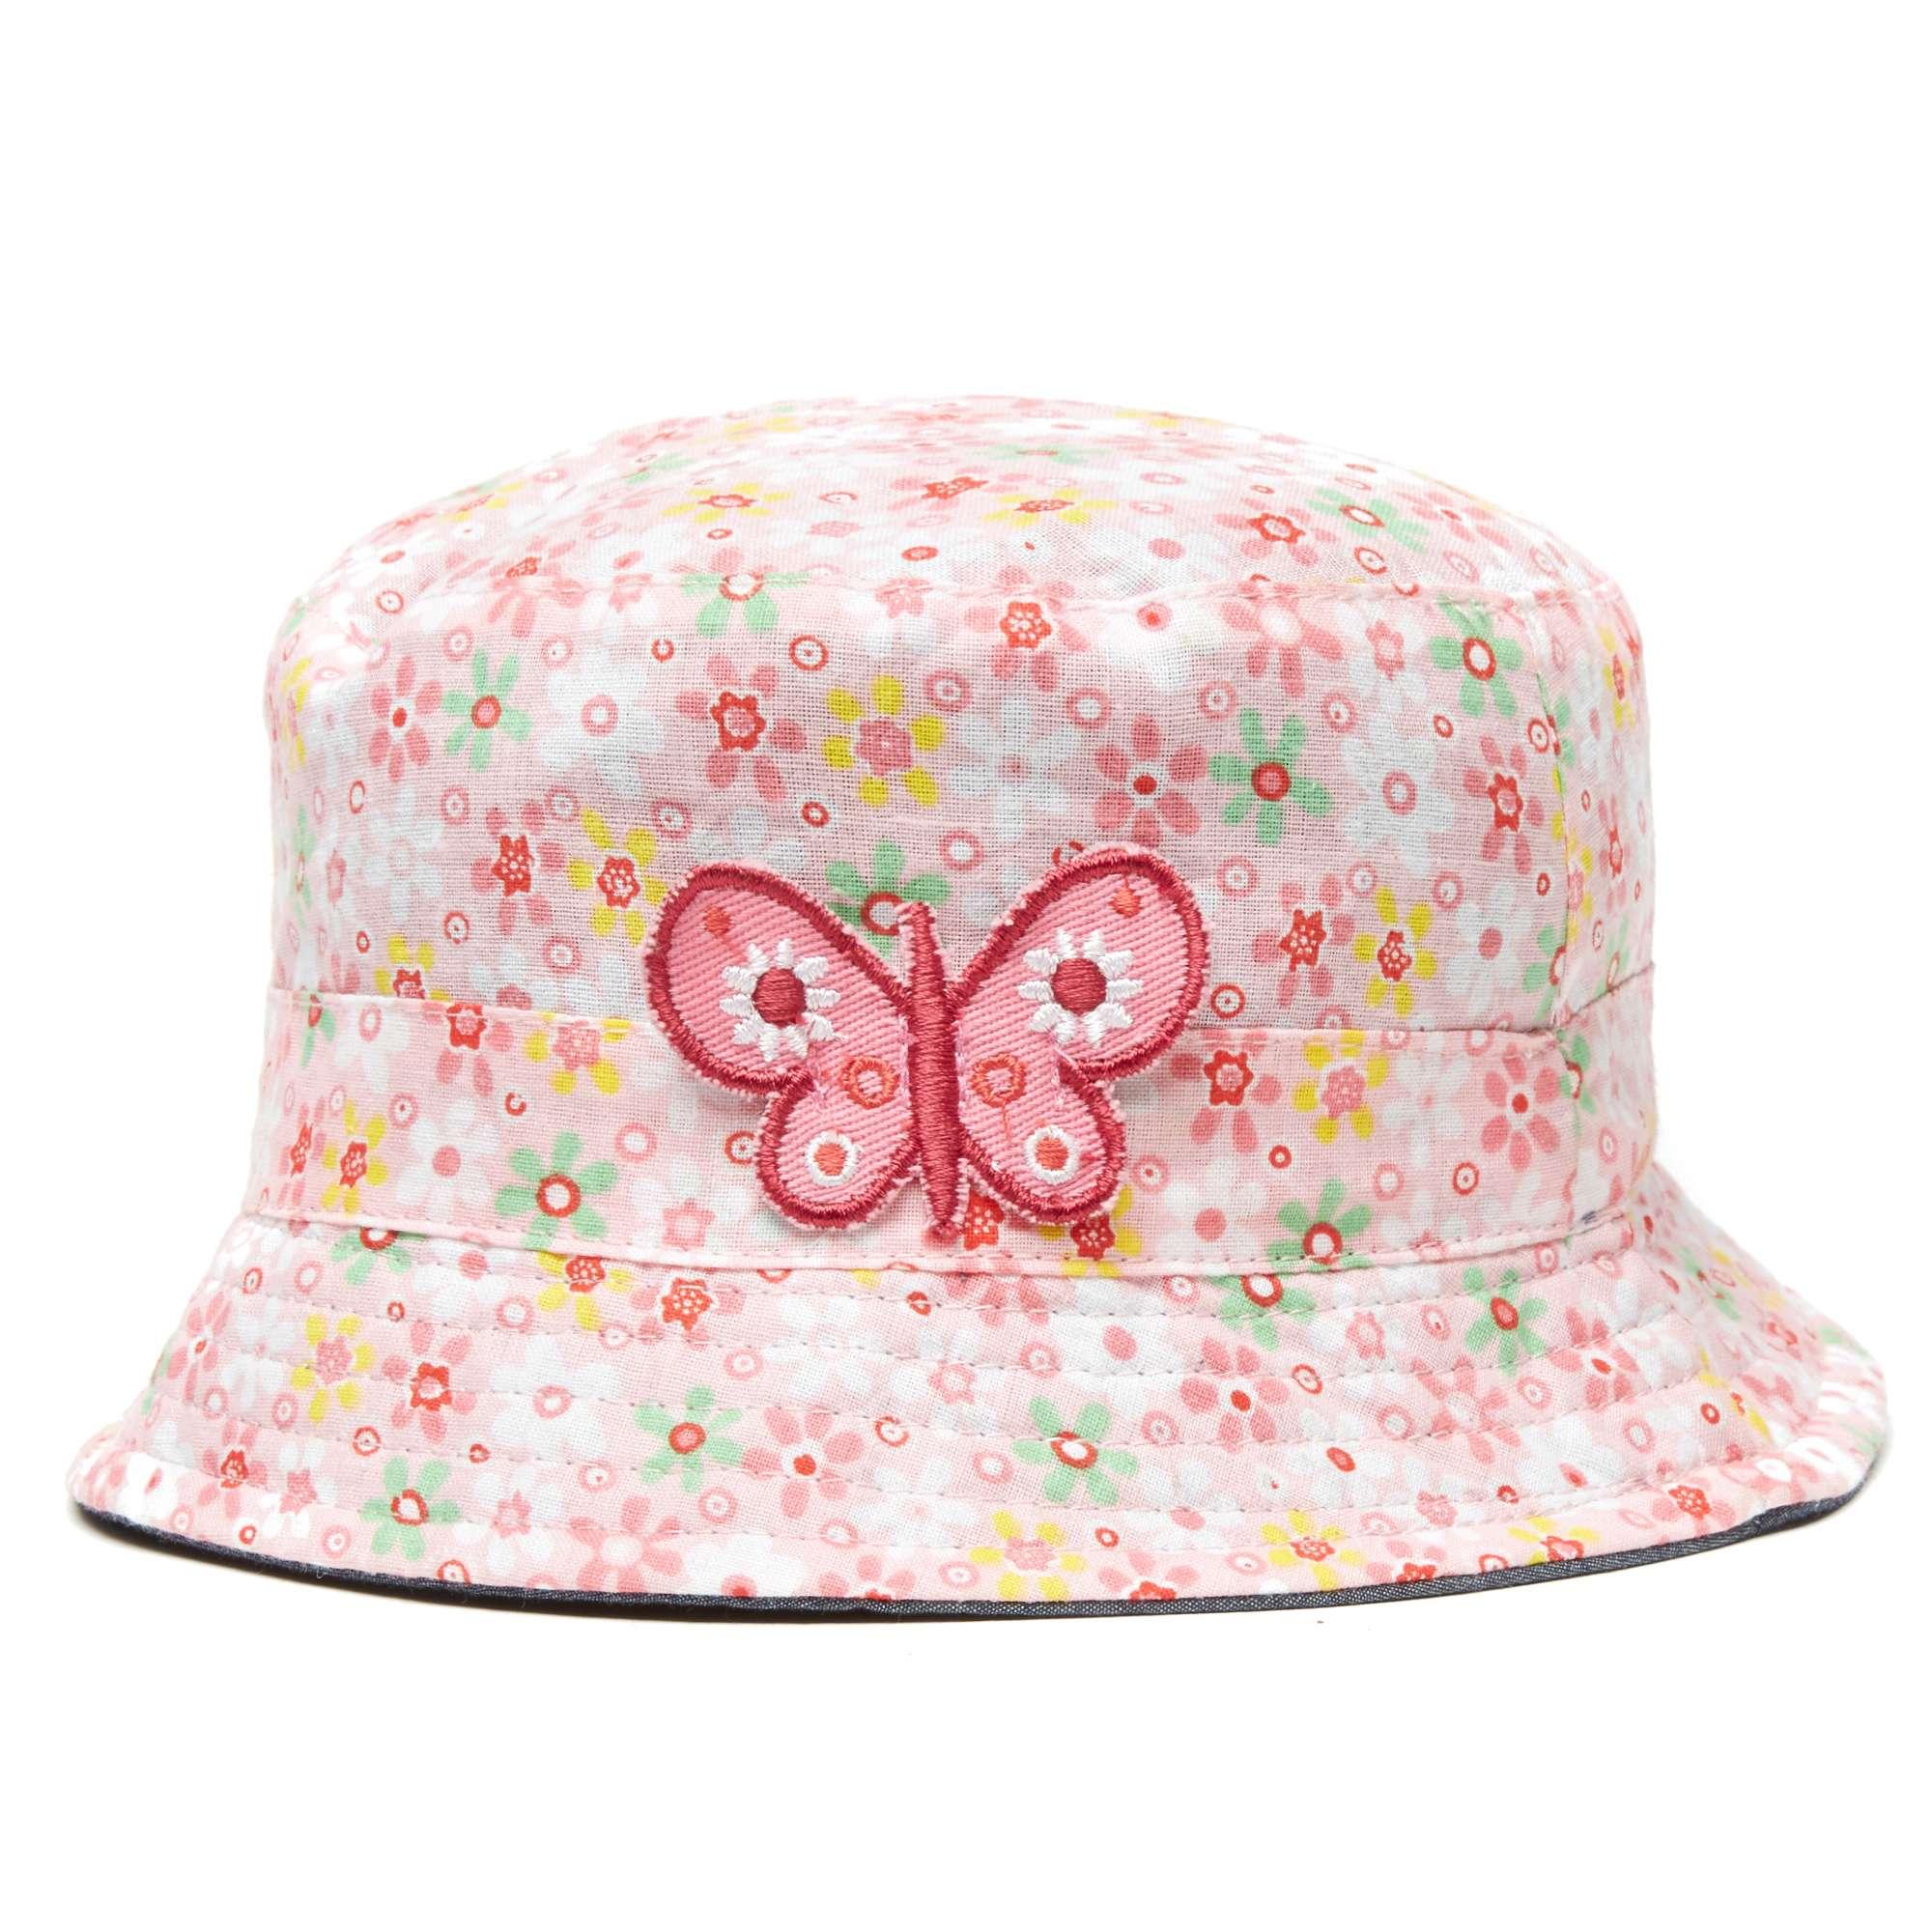 PETER STORM Girls' Butterfly Bucket Hat